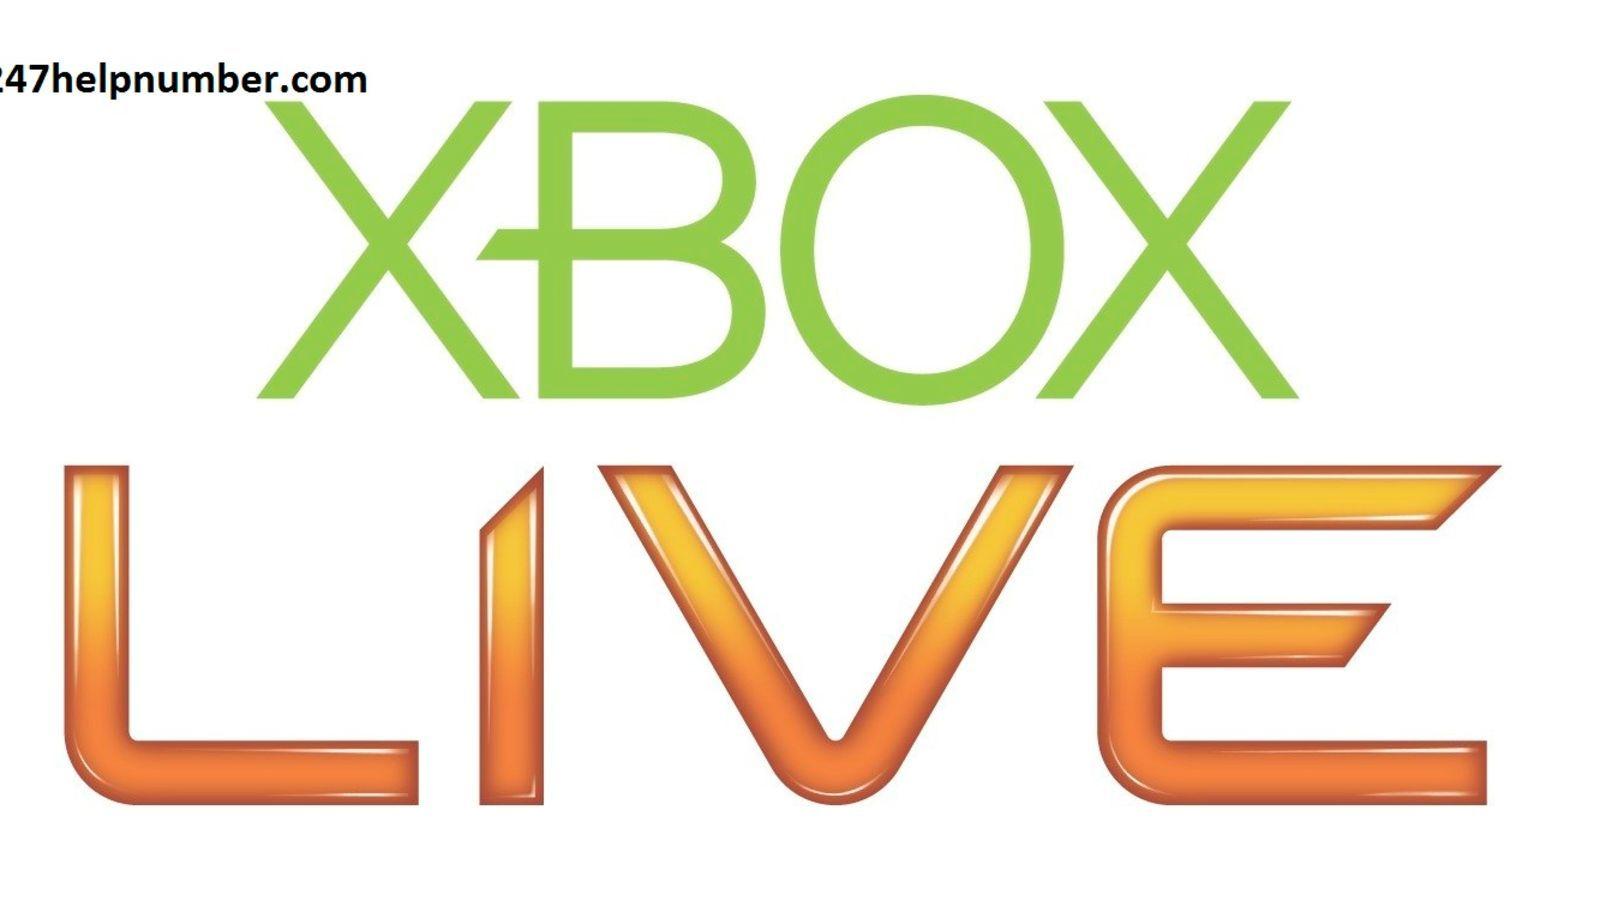 Xbox live customer care phone number Xbox live, Xbox